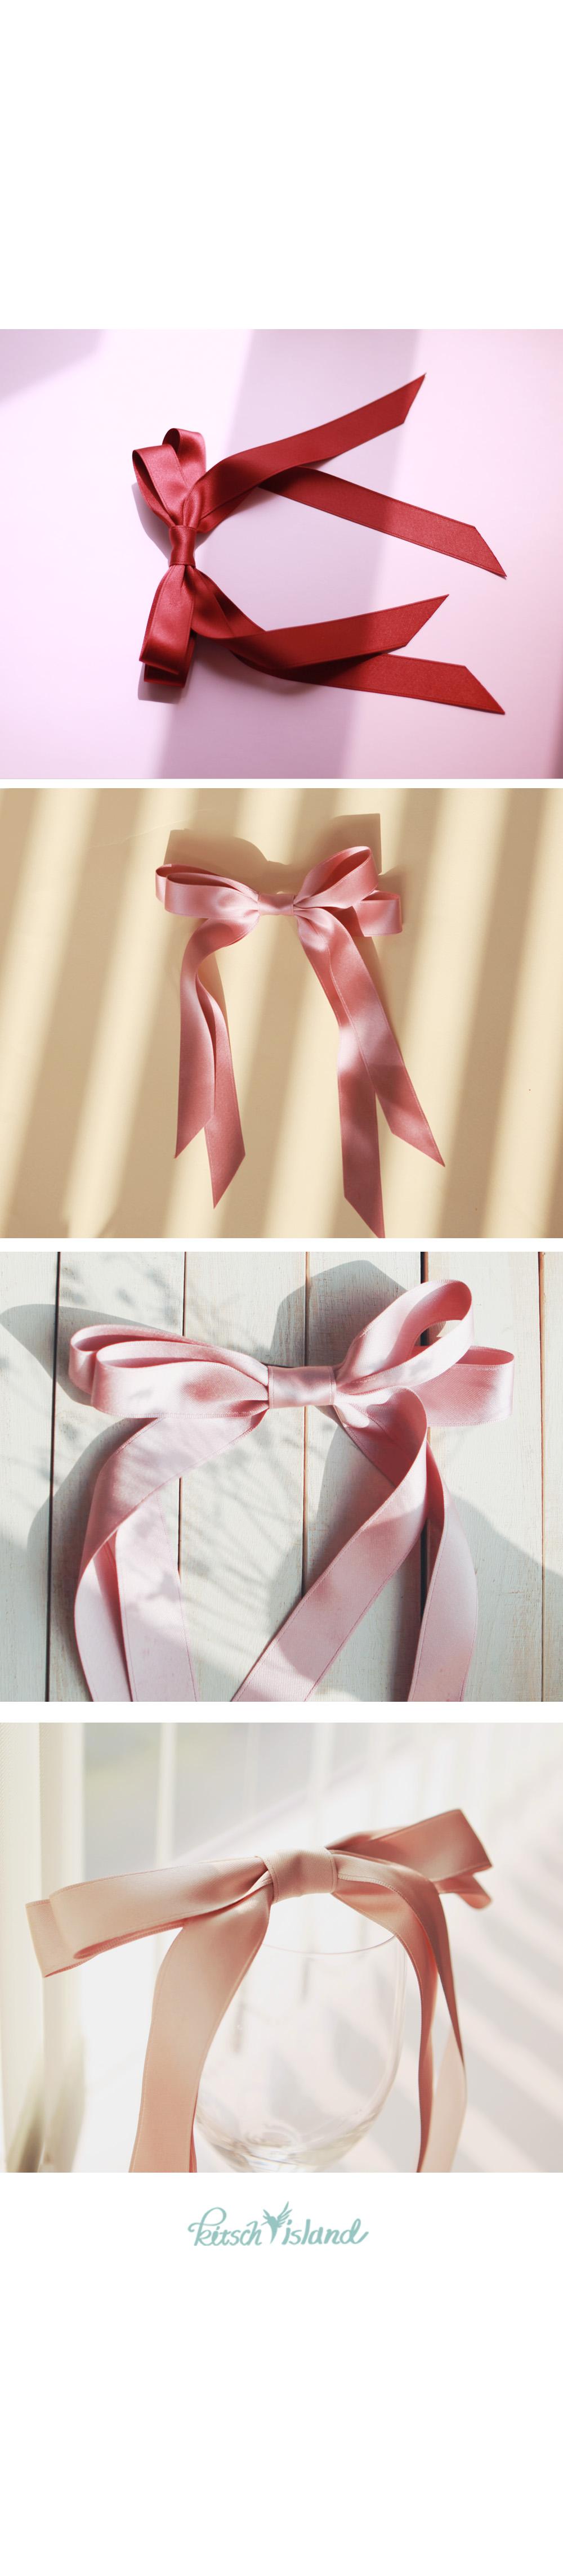 Super Ribbon 21cm 롱테일 - 키치아일랜드, 6,000원, 헤어핀/밴드/끈, 헤어핀/끈